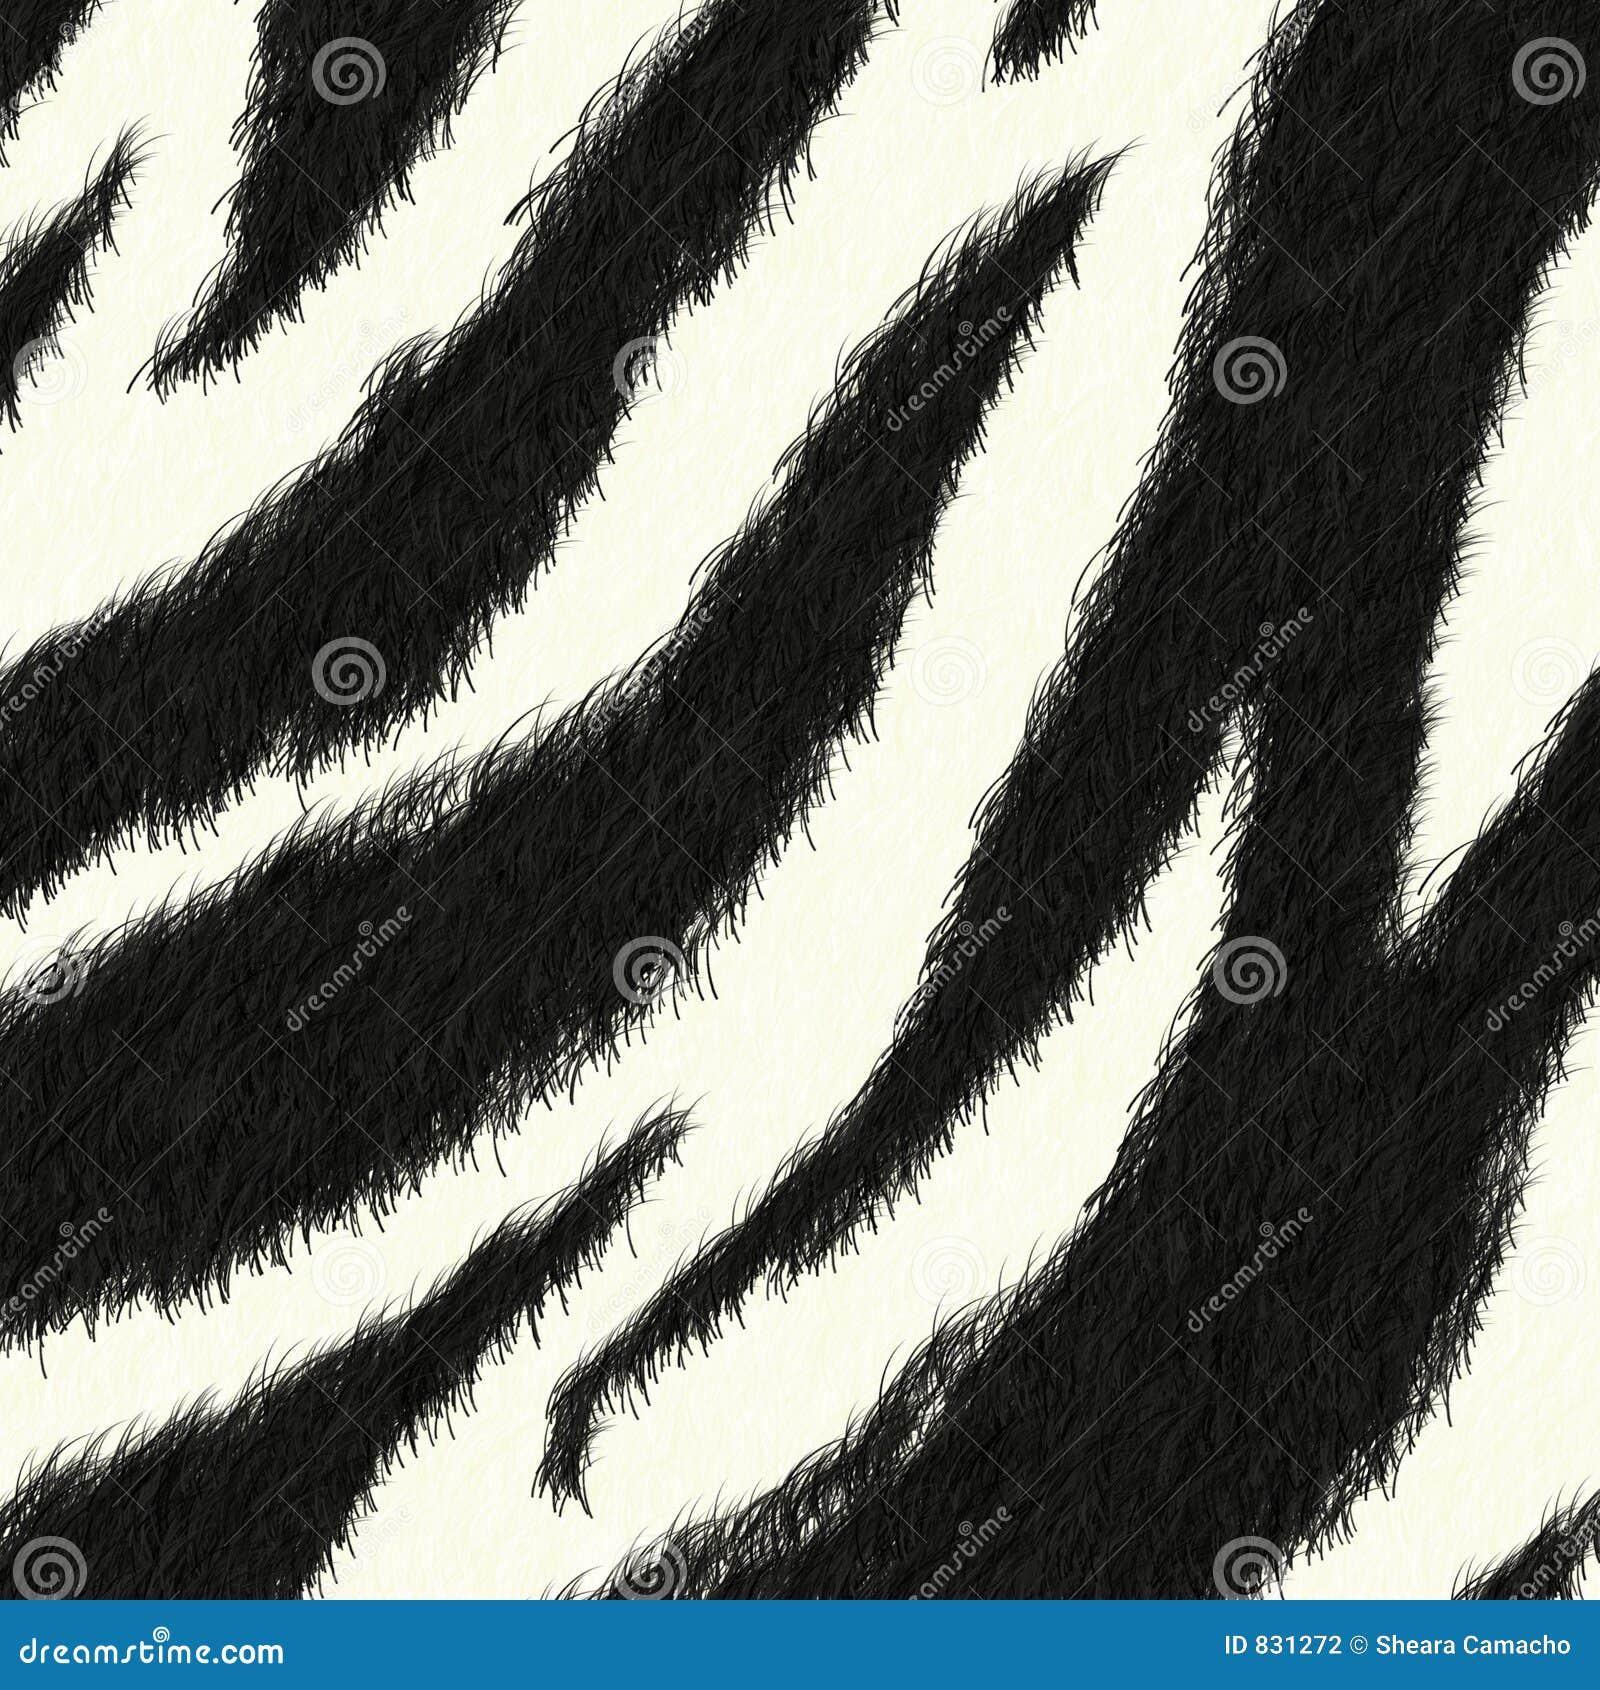 Zebra skin pattern background